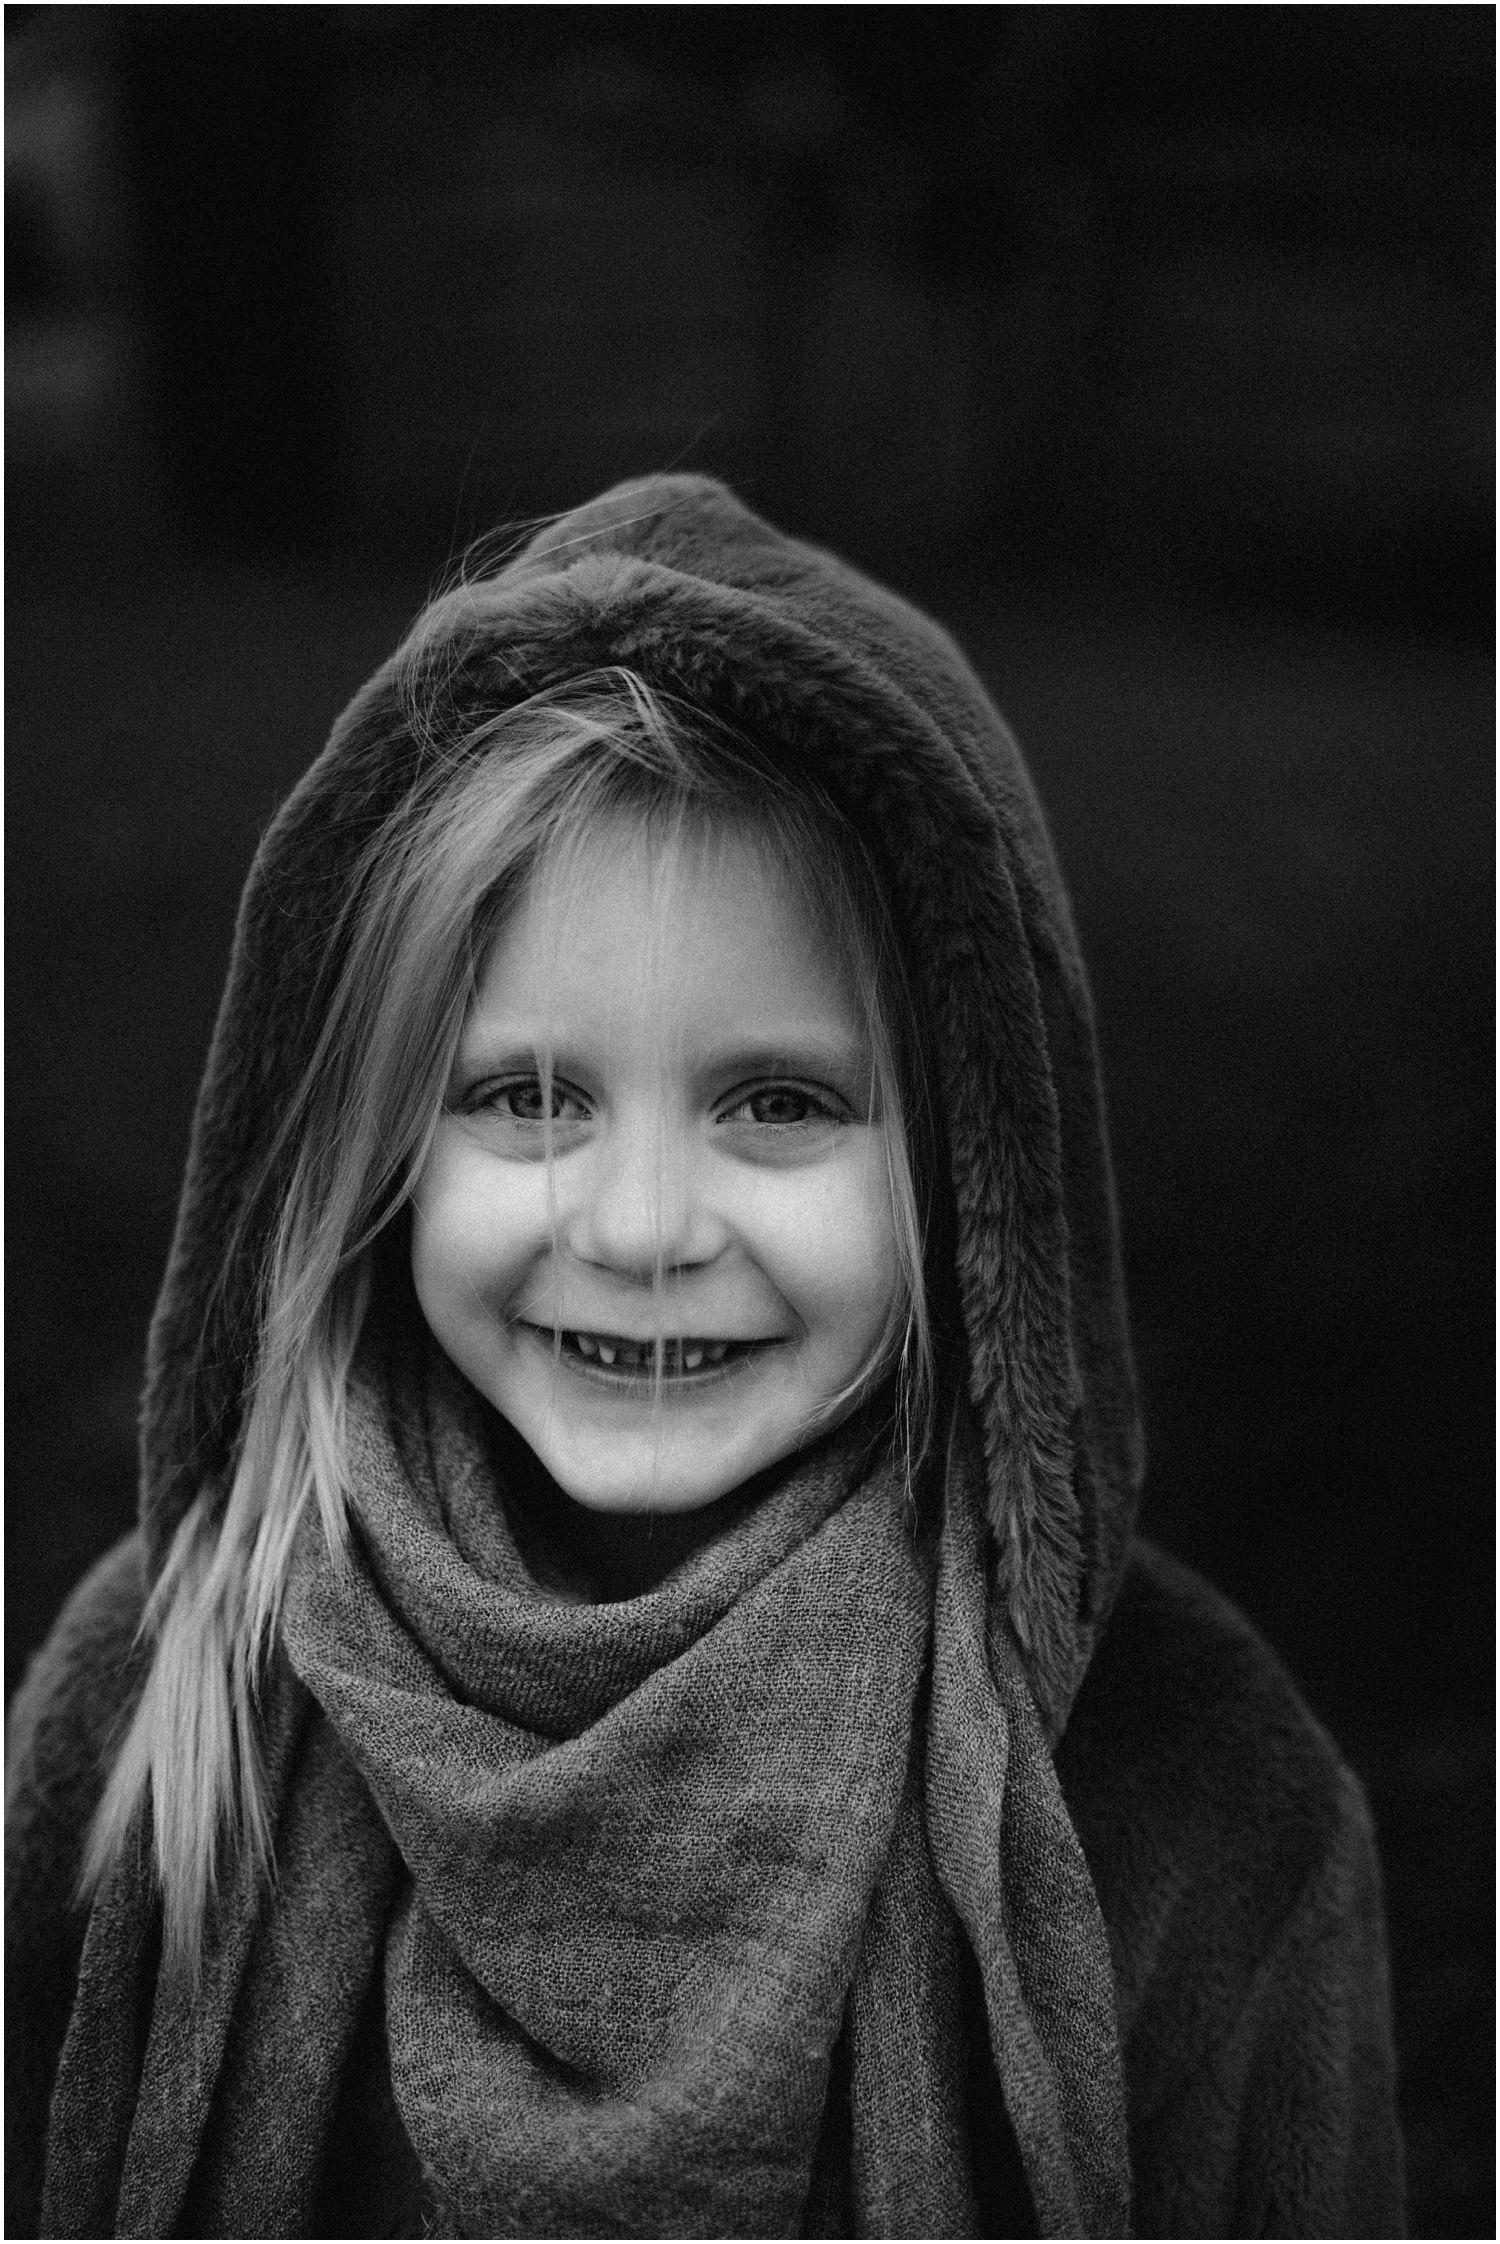 Kinderfotograf, Kinderfotografie, einfach Kind sein, Kinder Fotograf, Kinder Porträt, Kinder Bilder, Kinder Fotos, Fotograf Ostschweiz